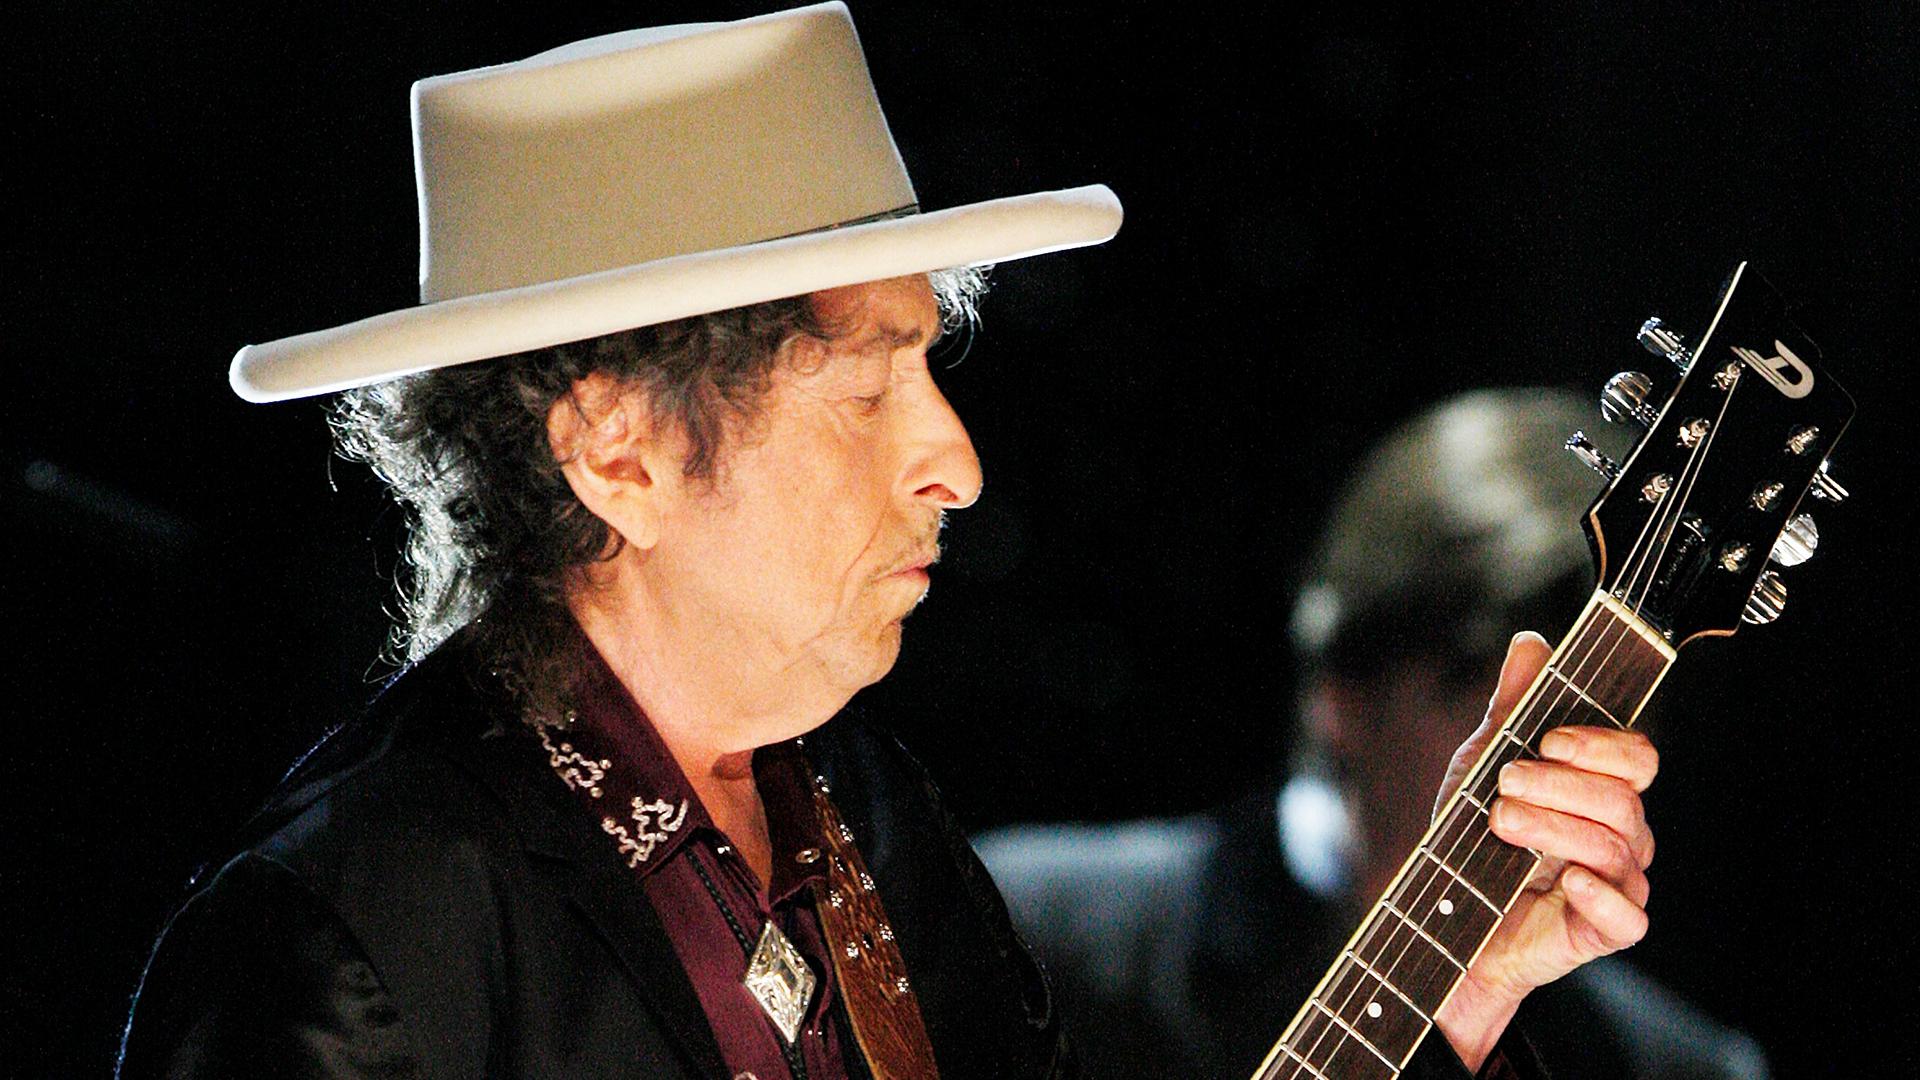 Timothee Chalamet in Talks for Bob Dylan Biopic